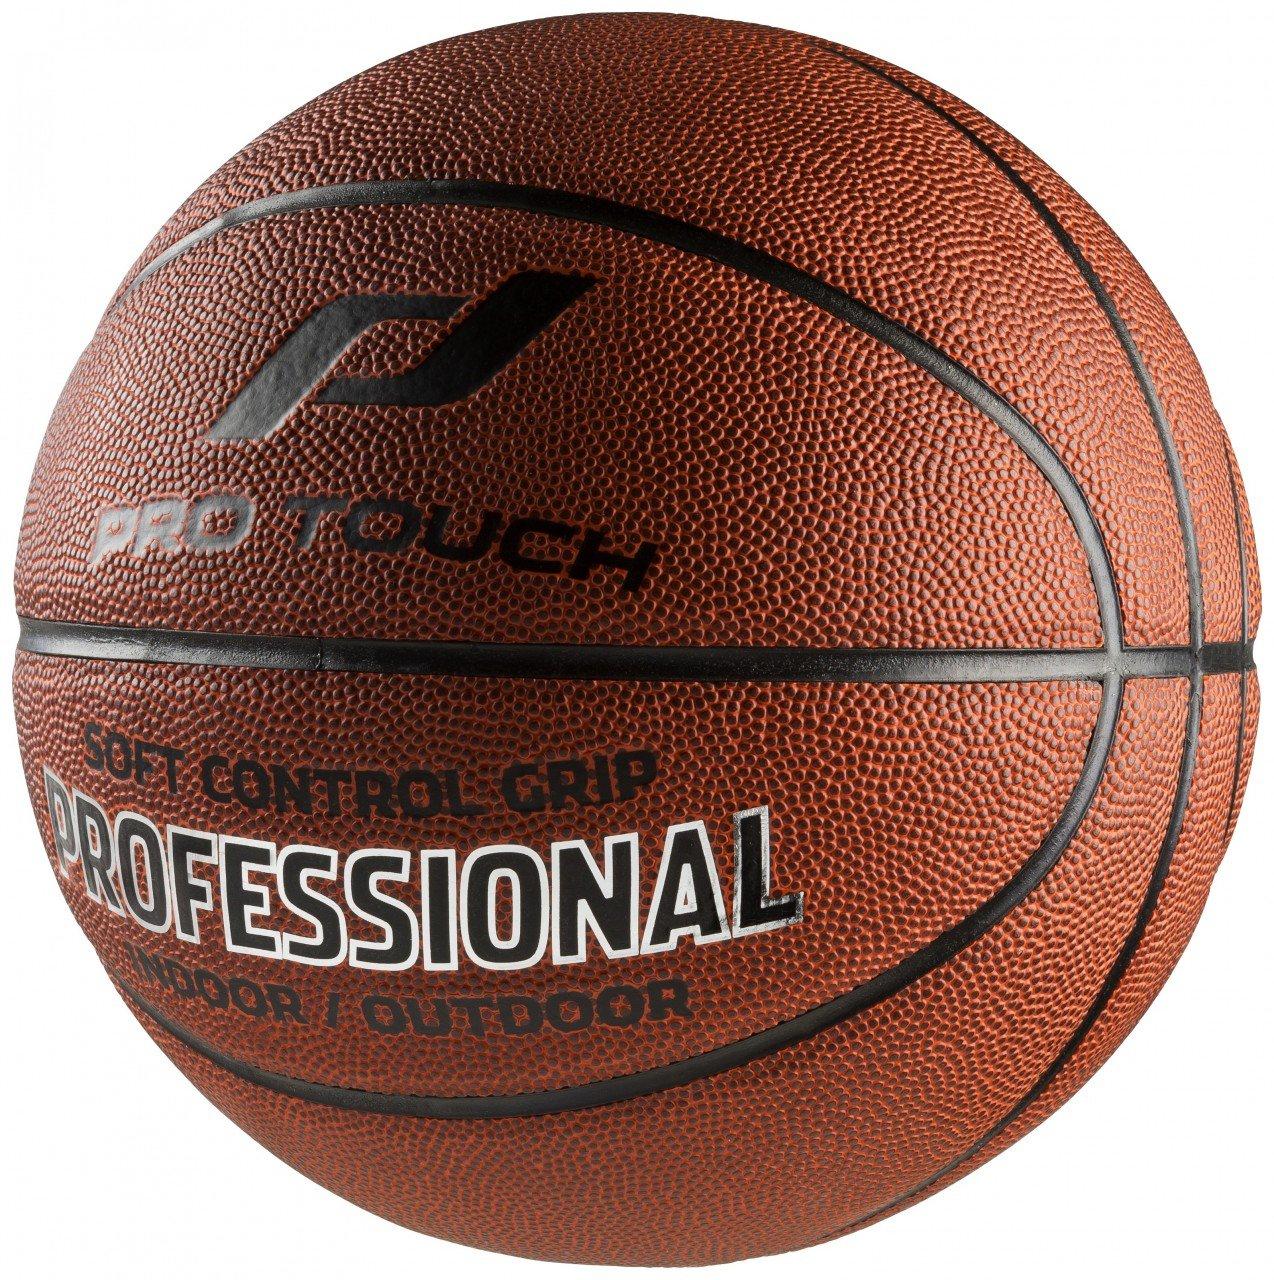 Bask-Ball Professional - braun/schw/silb PRO TOUCH